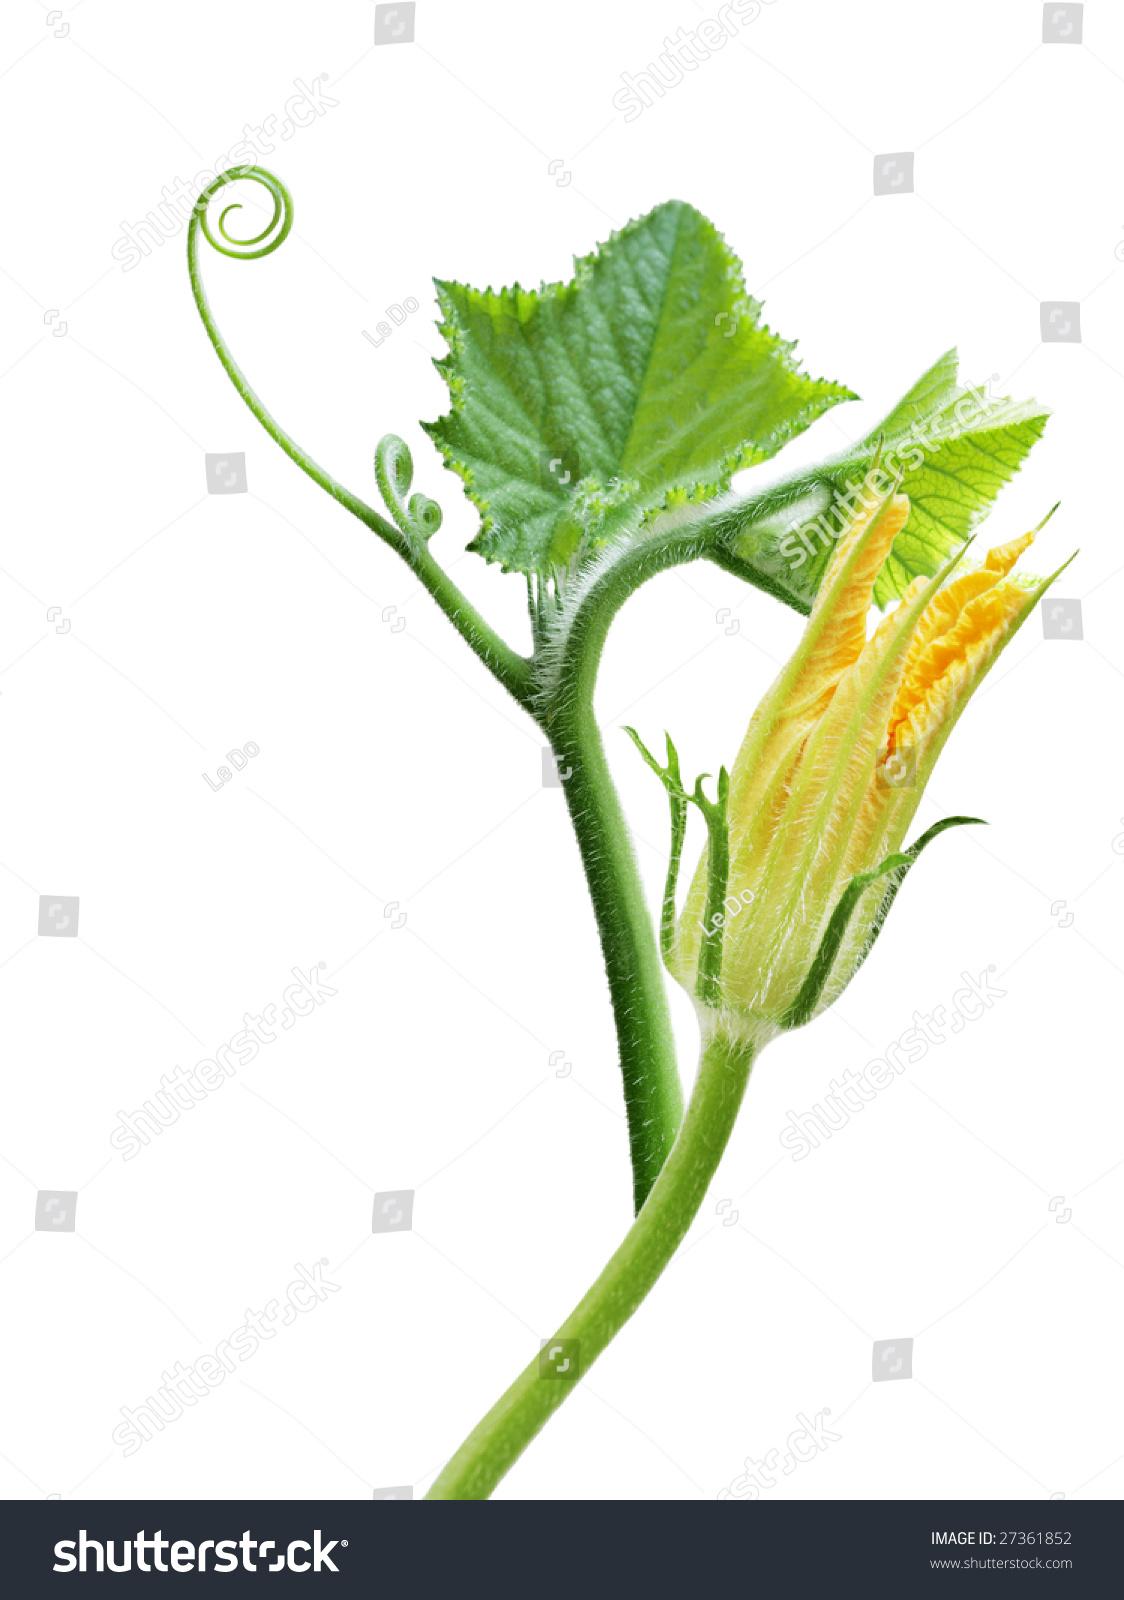 Squash leaves flower isolated on white stock photo edit now squash leaves and flower isolated on white background mightylinksfo